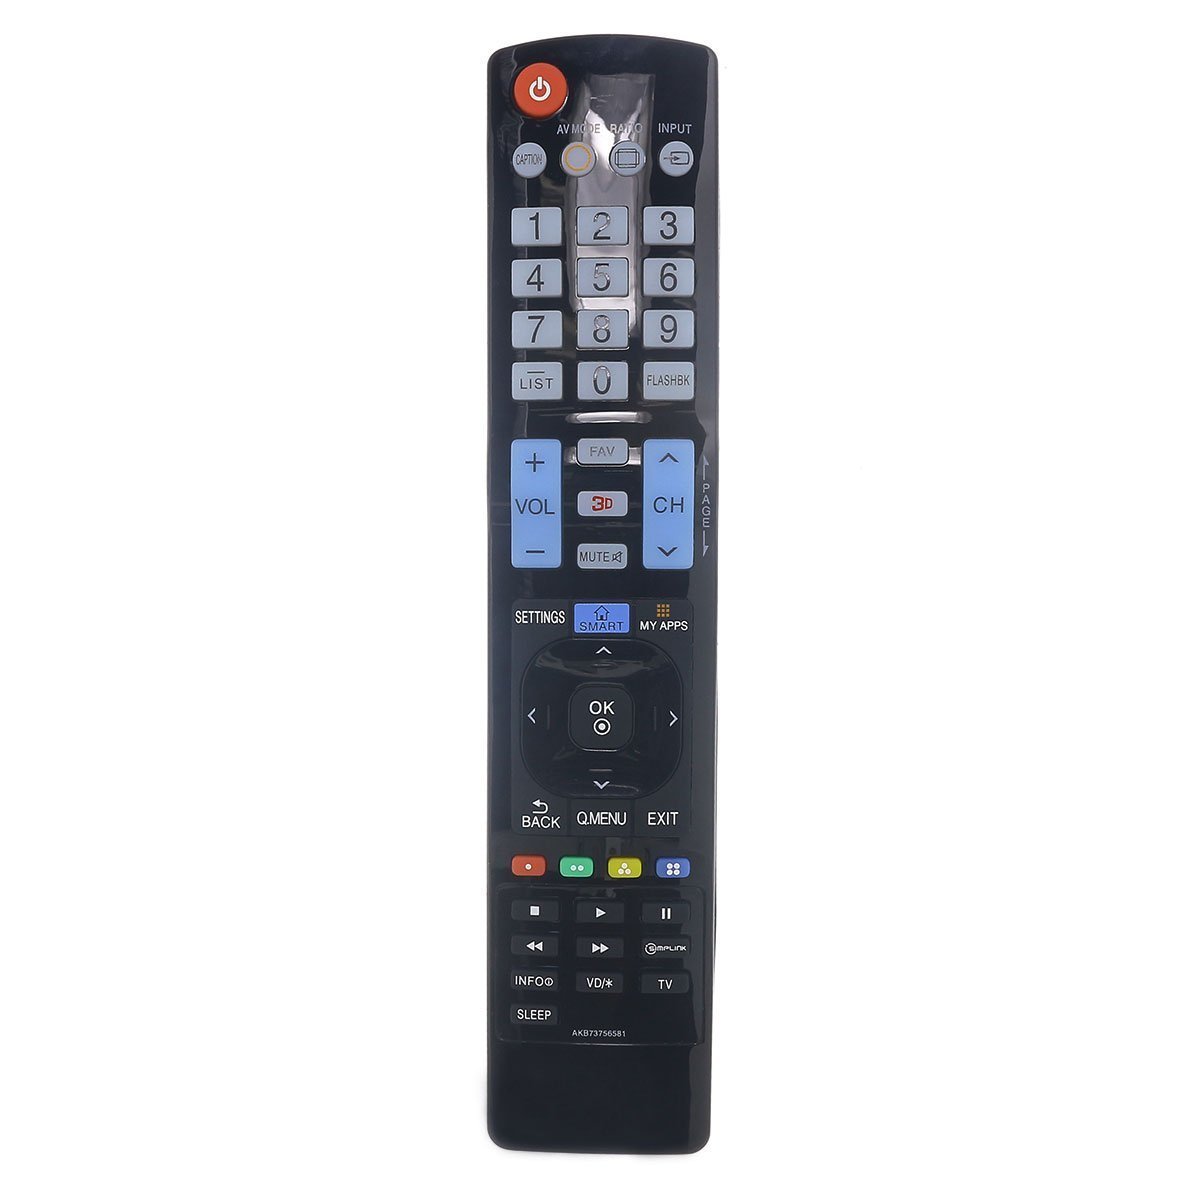 Mando a Distancia Universal para LG TV AKB73756581: Amazon.es: Electrónica